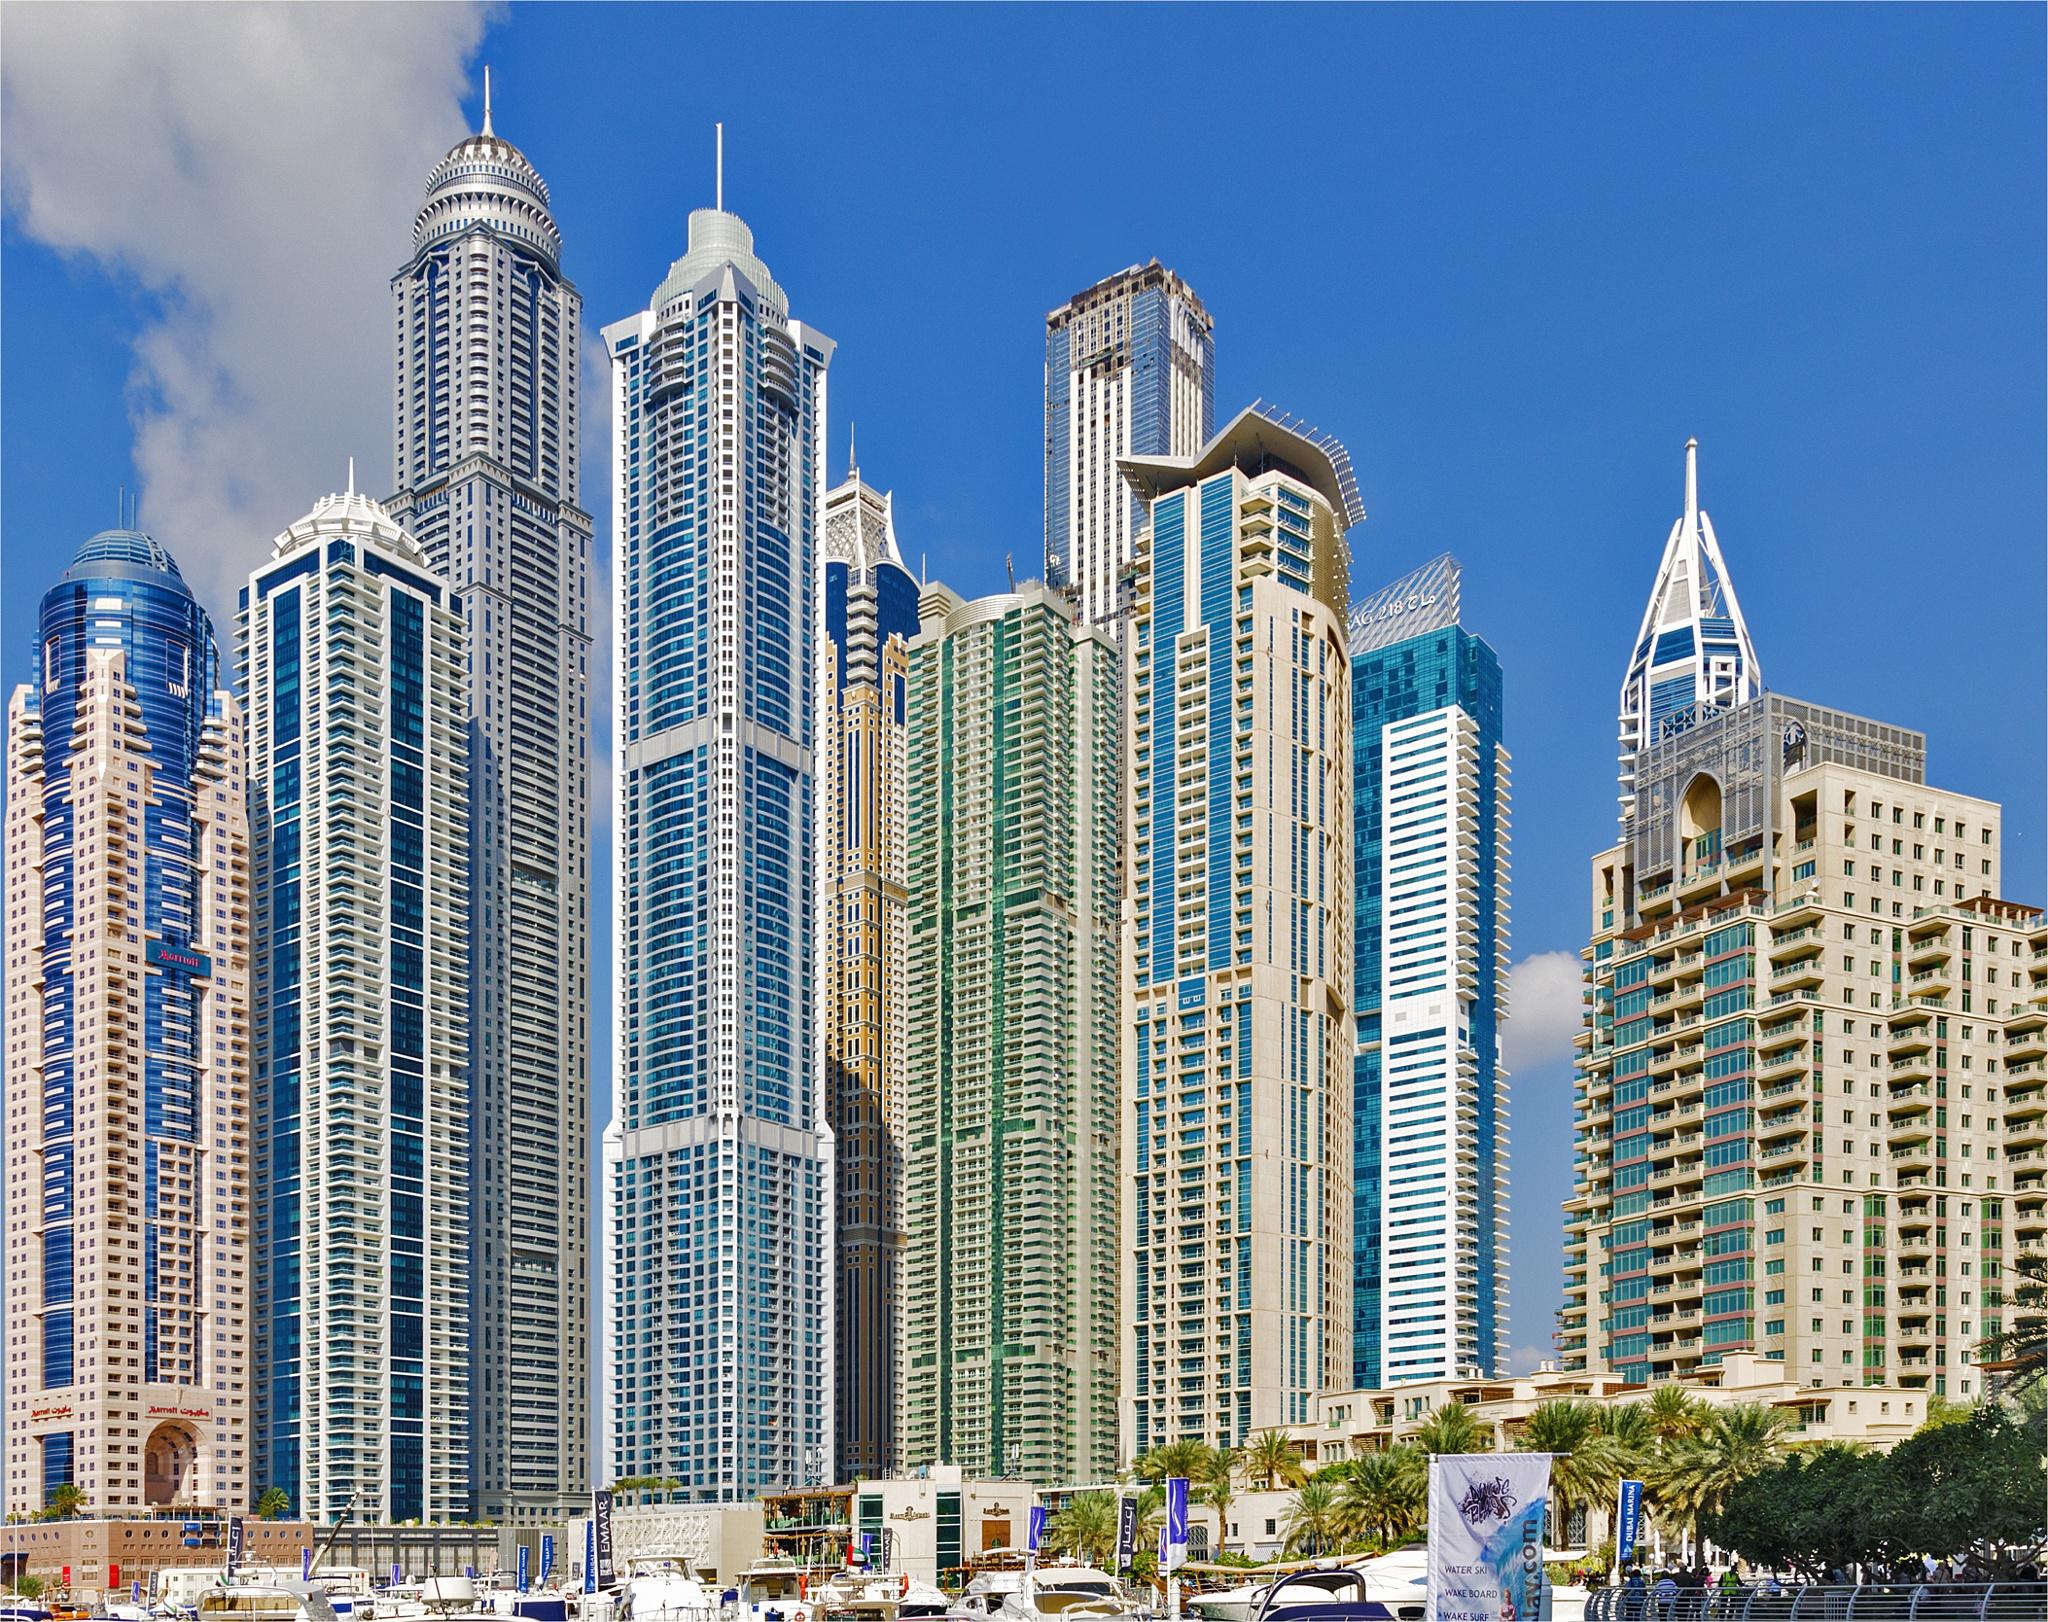 DUBAI MARINA by HeidiGK